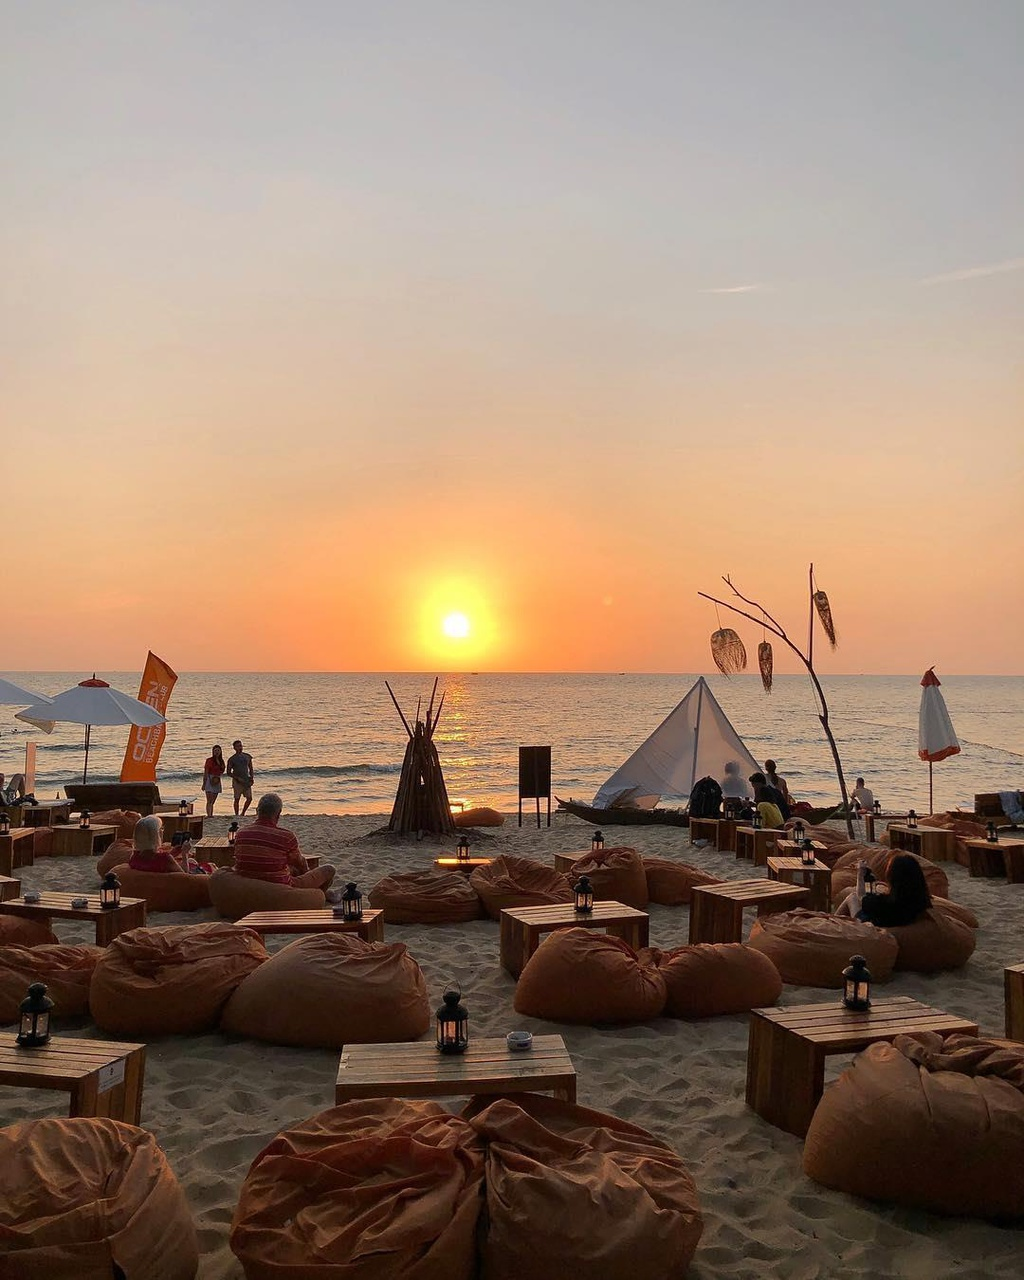 Den beach bar ngam hoang hon Phu Quoc tuyet dep hinh anh 10